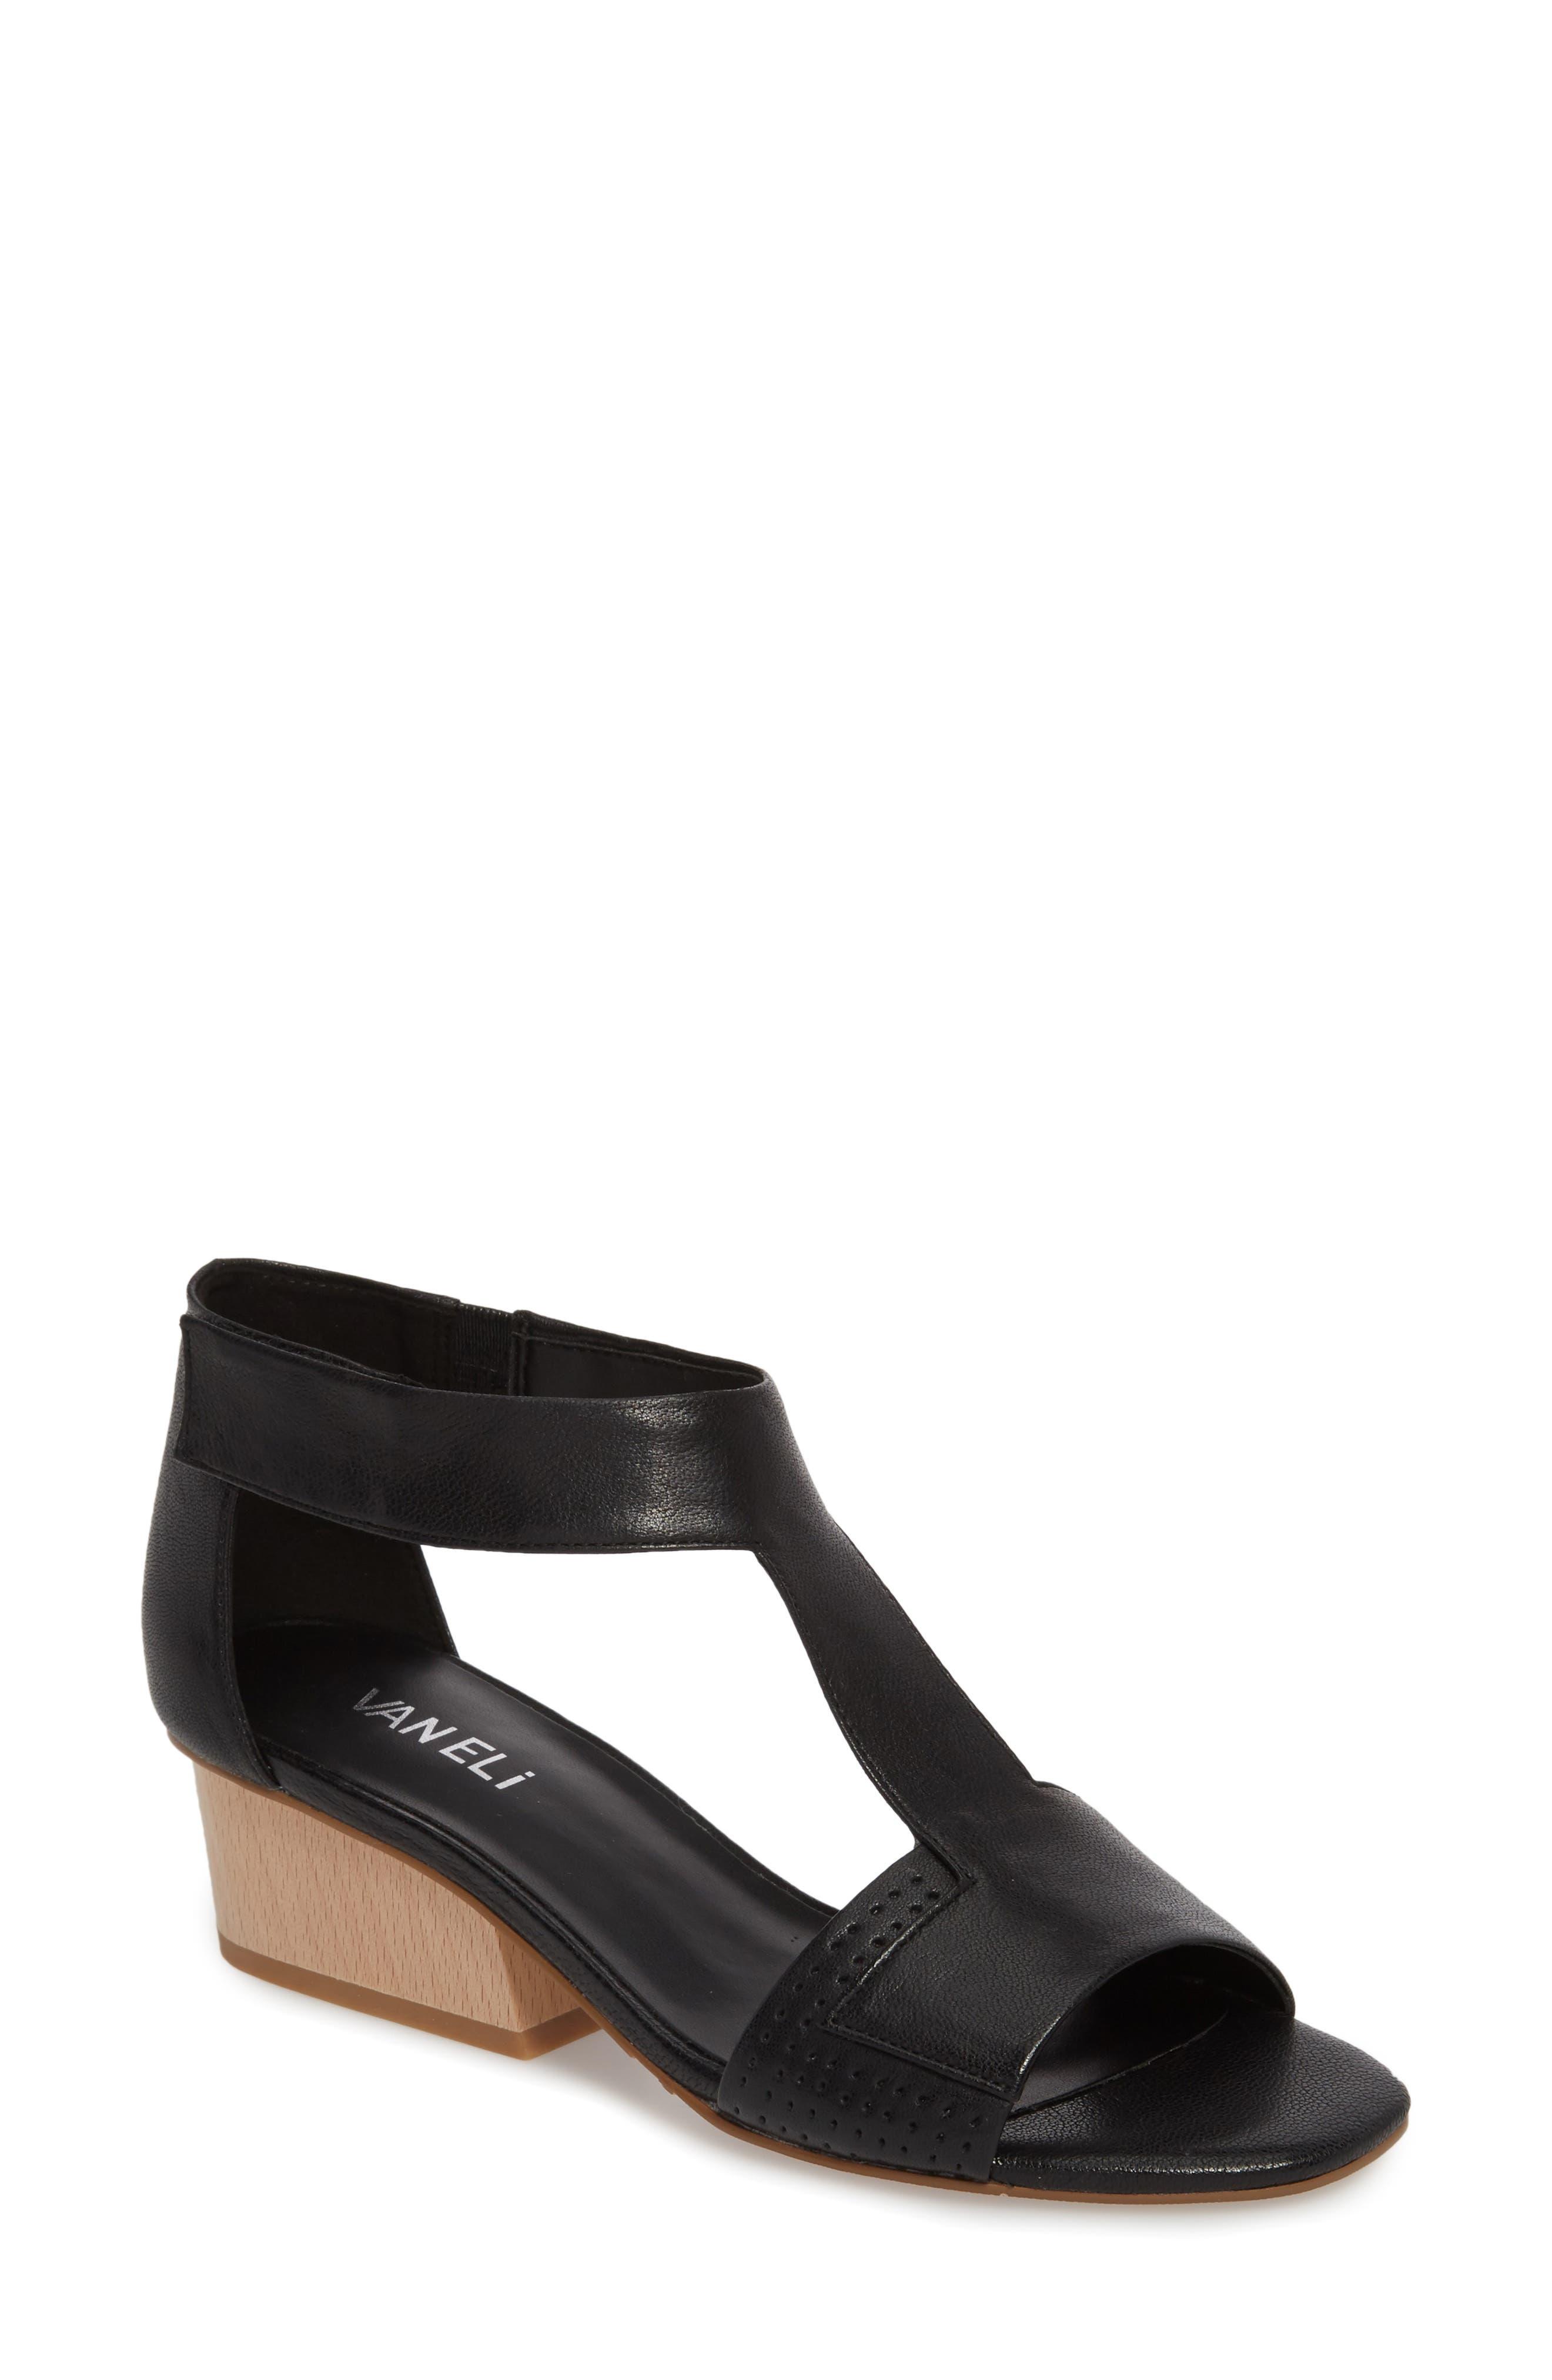 Calyx Block Heel Sandal,                             Main thumbnail 1, color,                             BLACK LEATHER